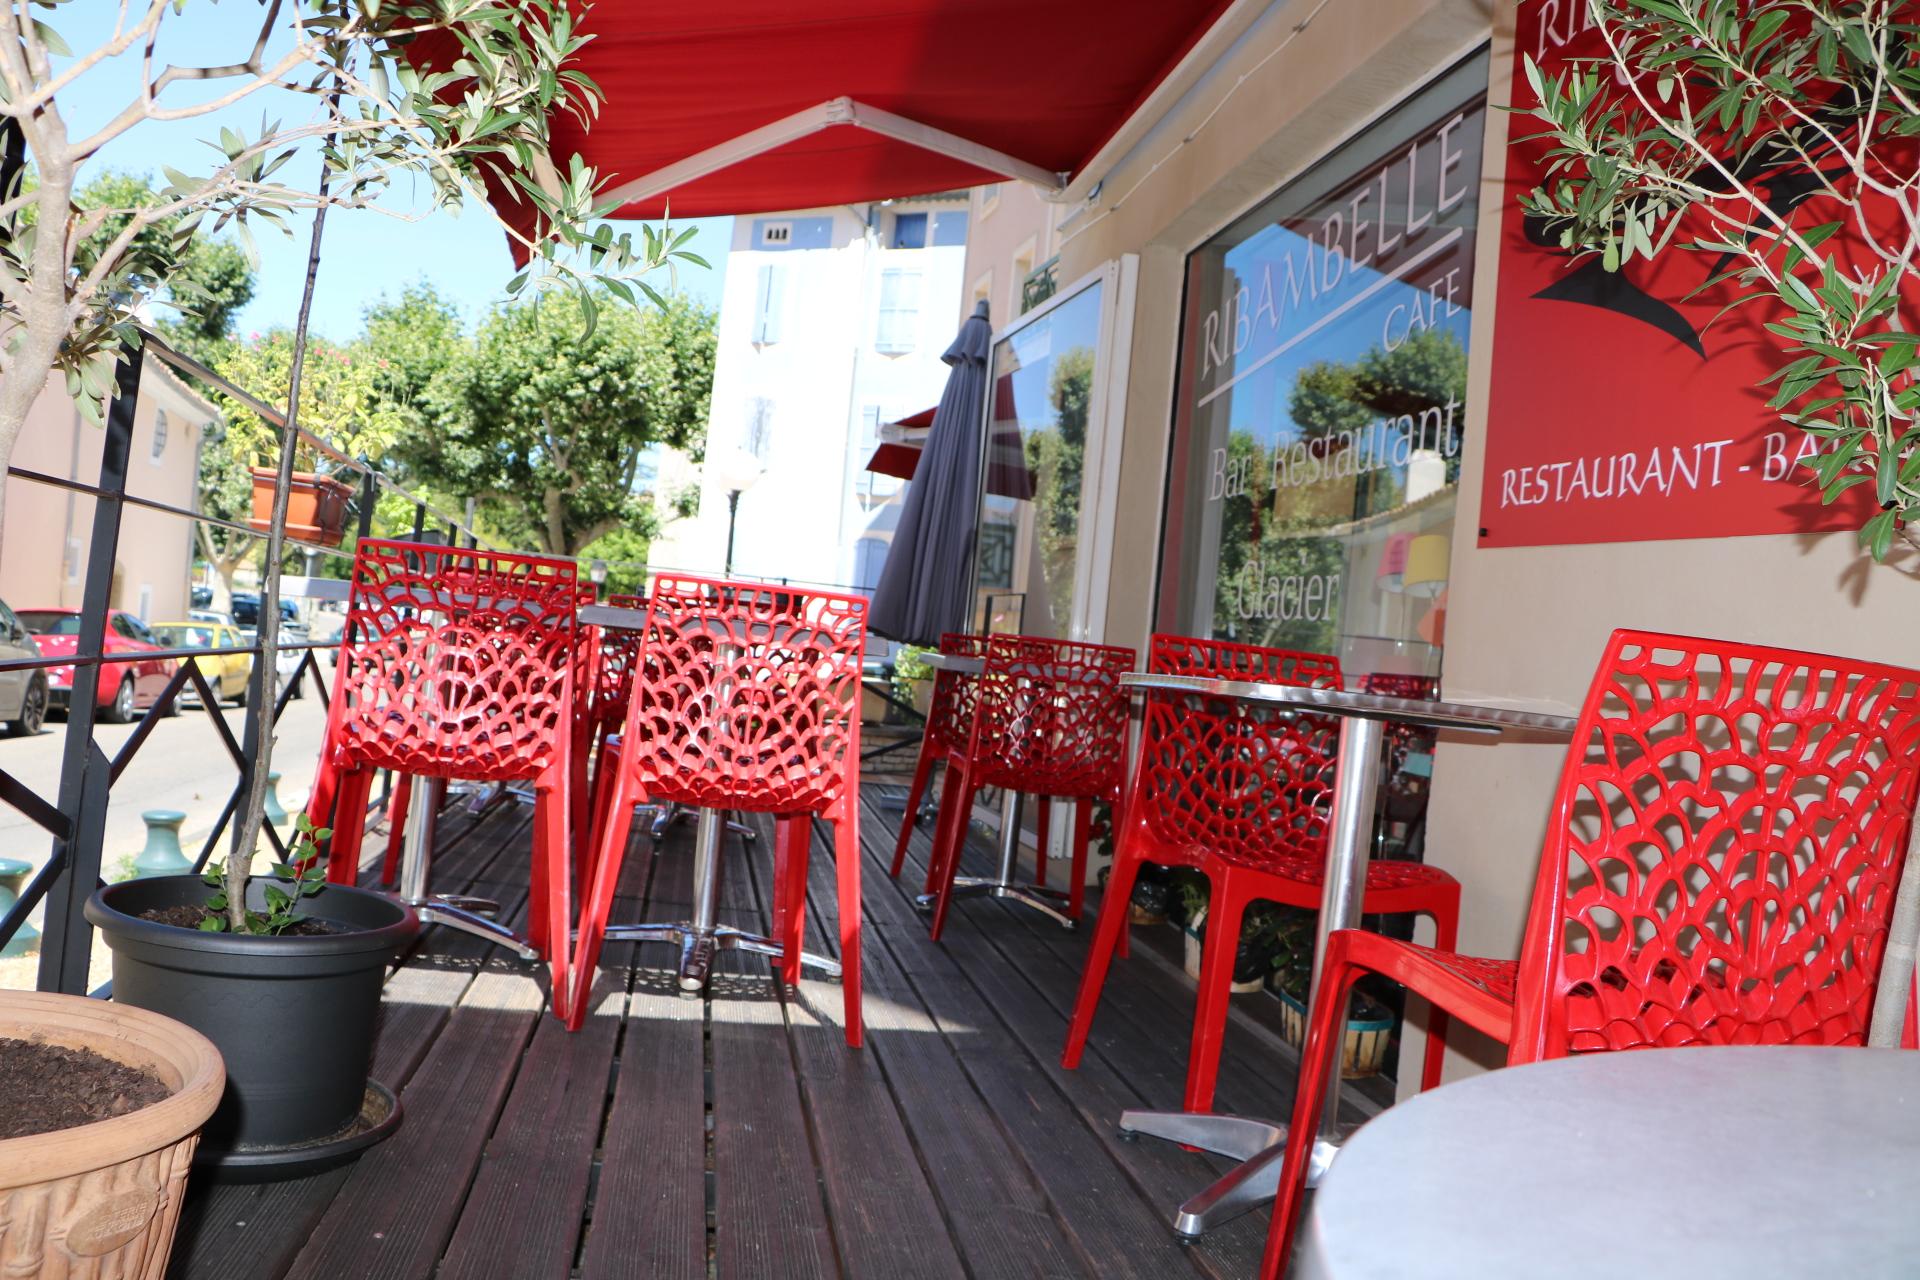 Restaurant Vaison La Romaine (6)